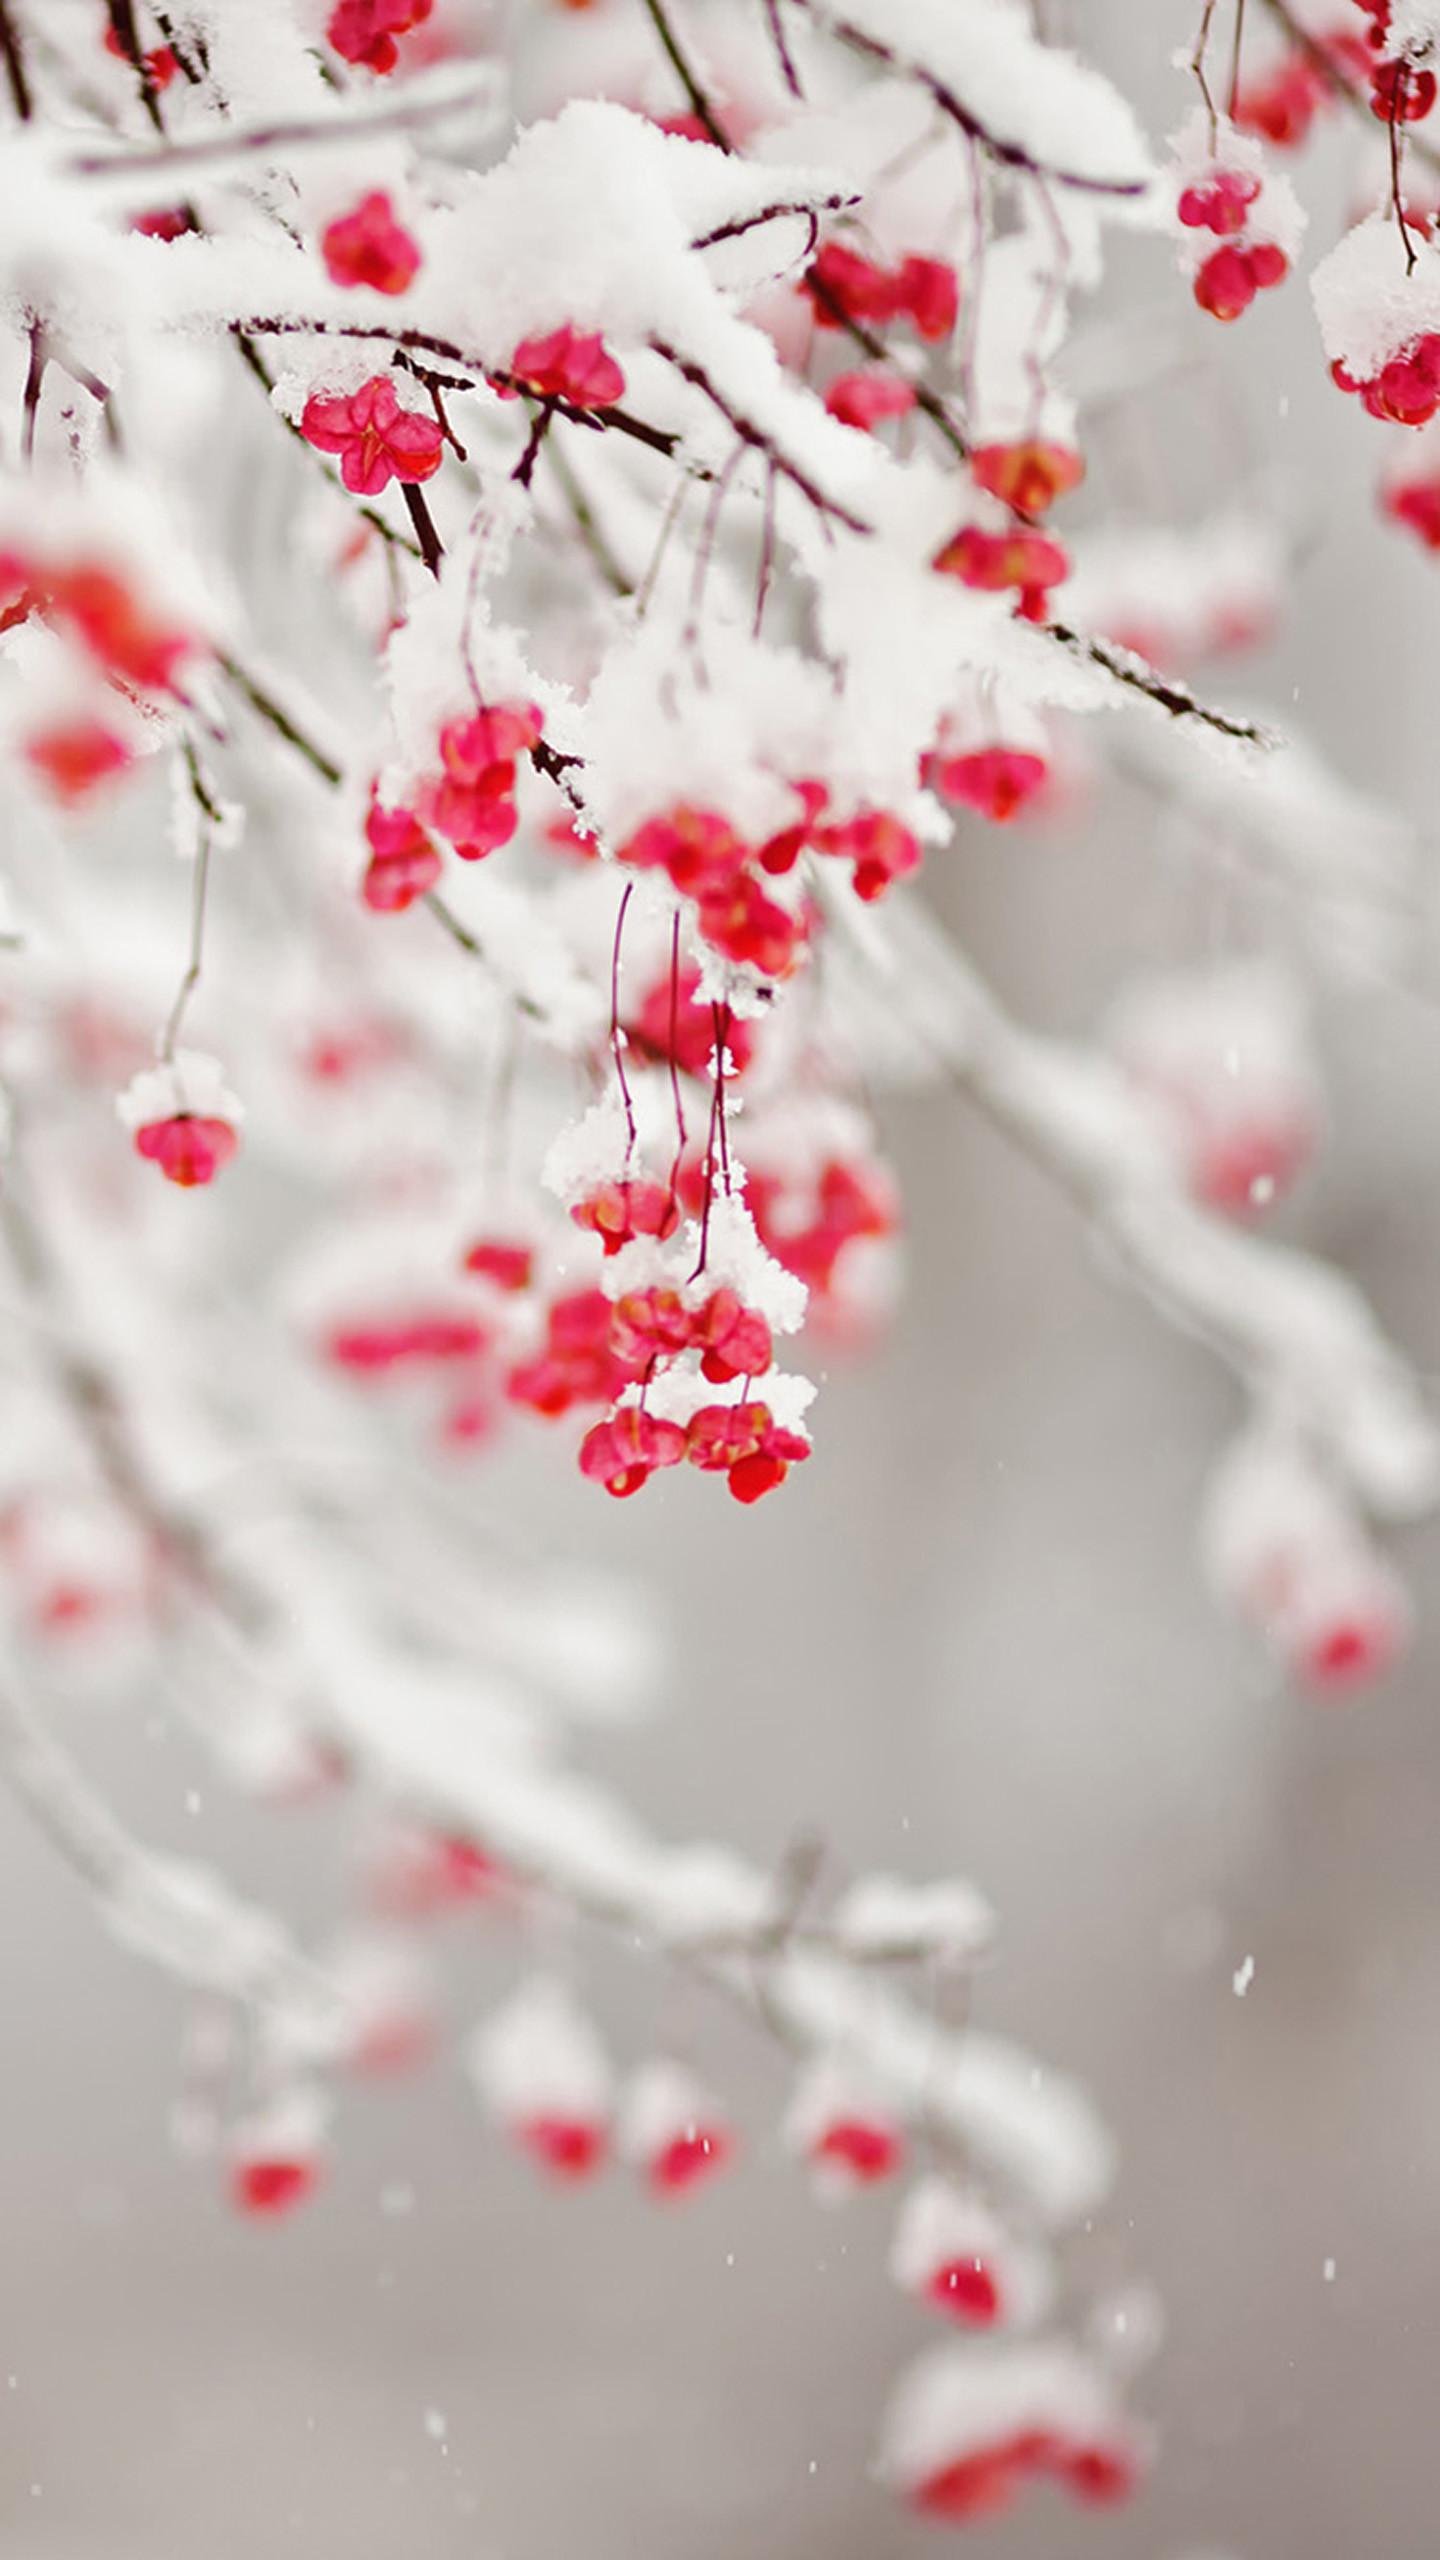 Winter Fruit Galaxy S7 Wallpaper